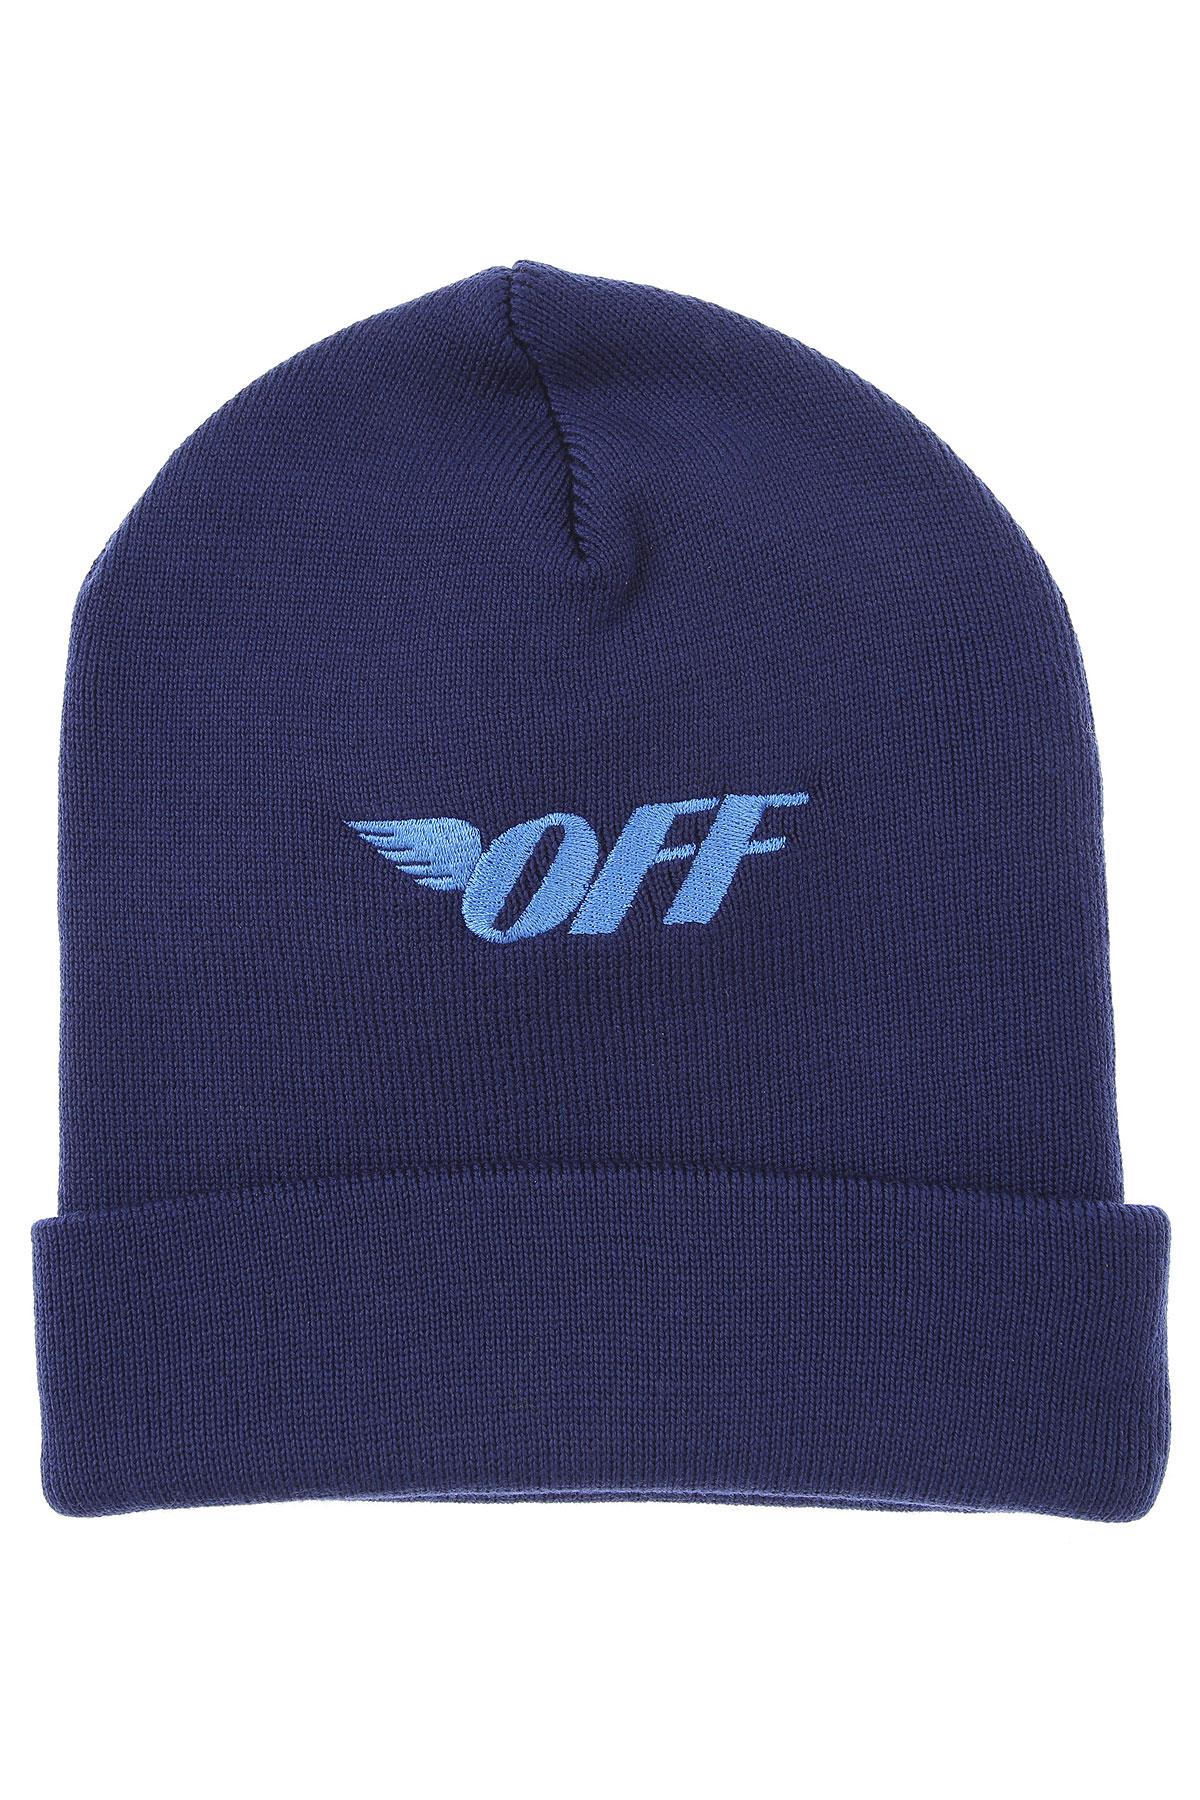 Off-White Virgil Abloh Hat for Women On Sale, Blu, Wool, 2019